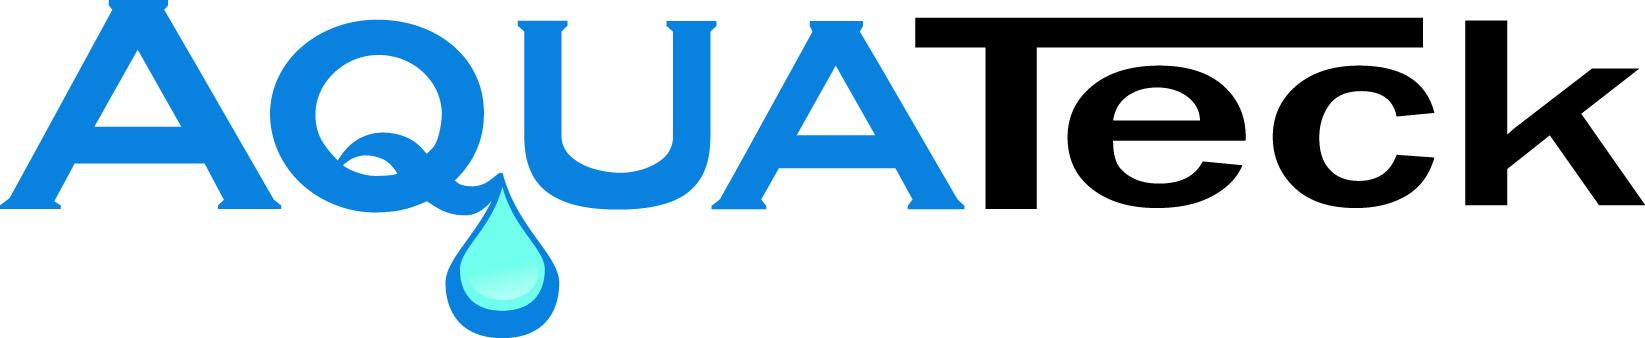 Aquatic Laminate, commercial-grade water proof laminate flooring